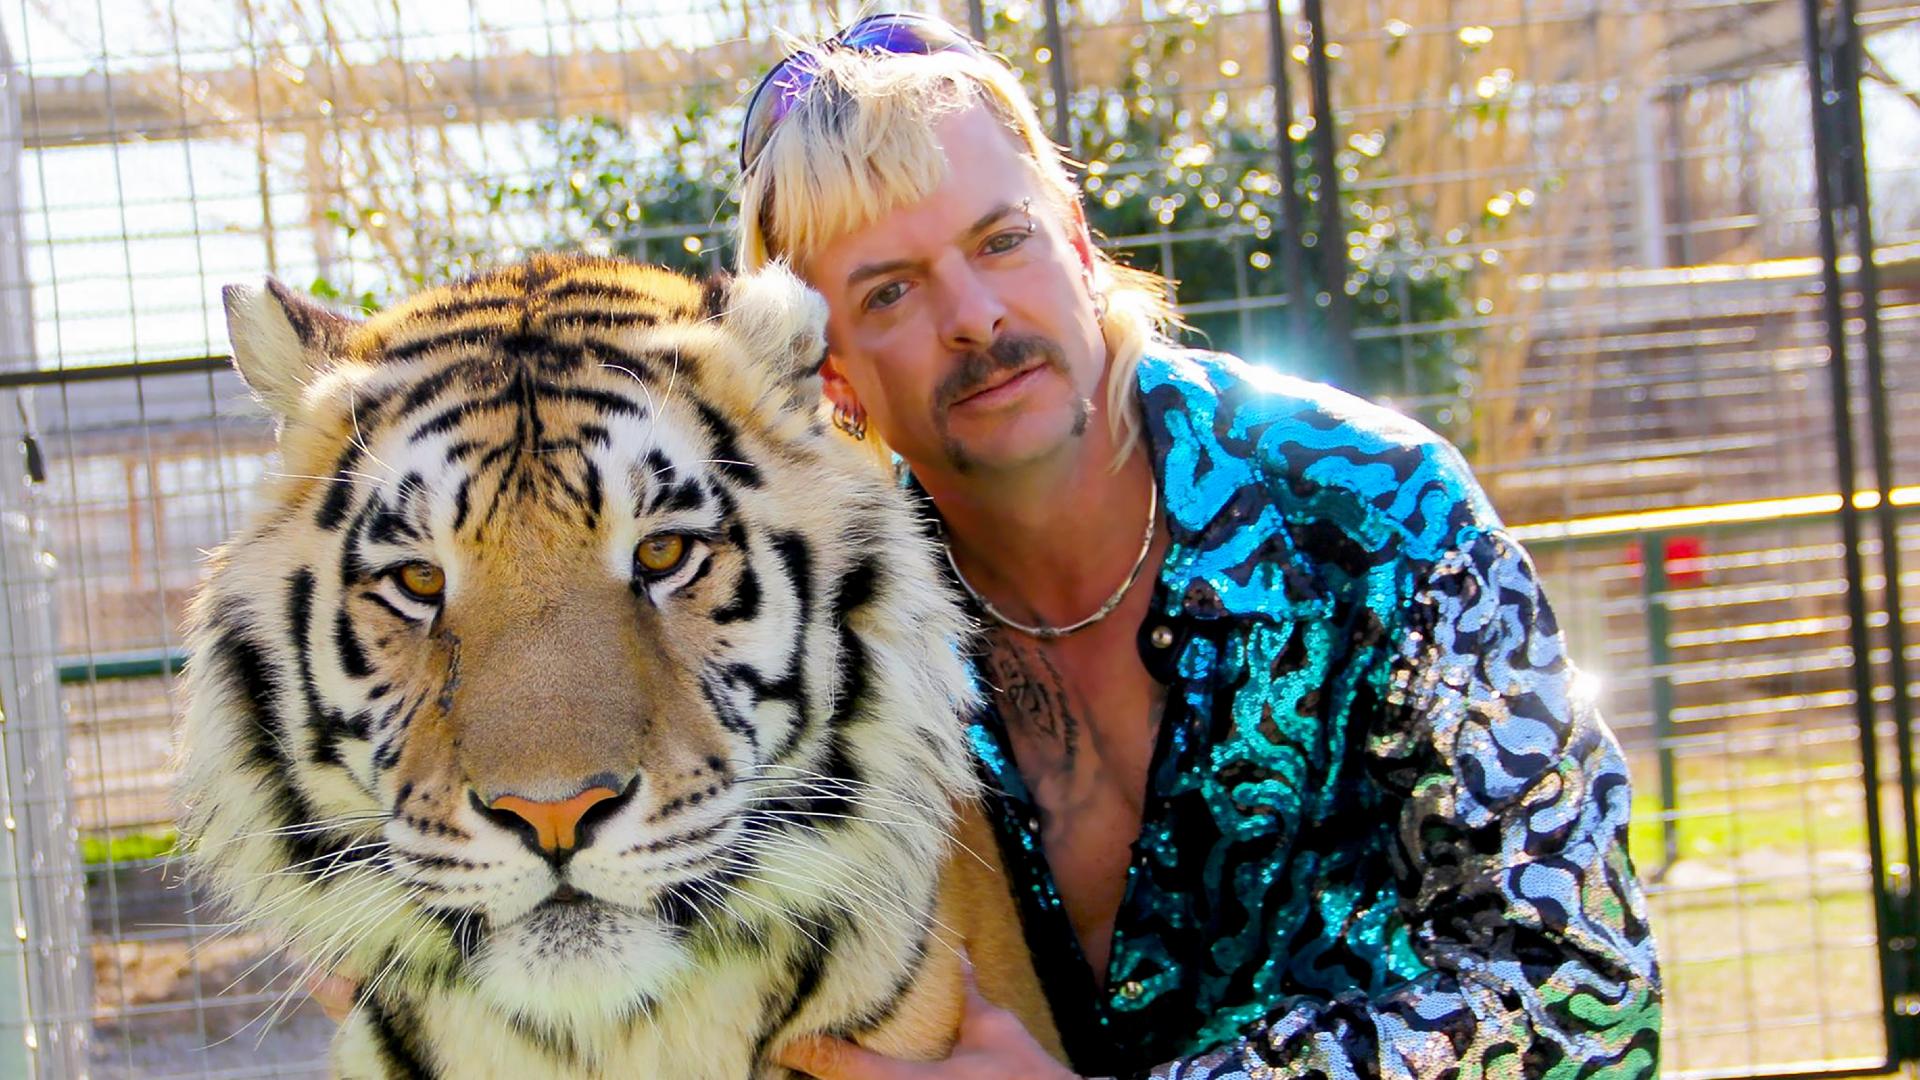 Mejores documentales de Netflix - Tiger King